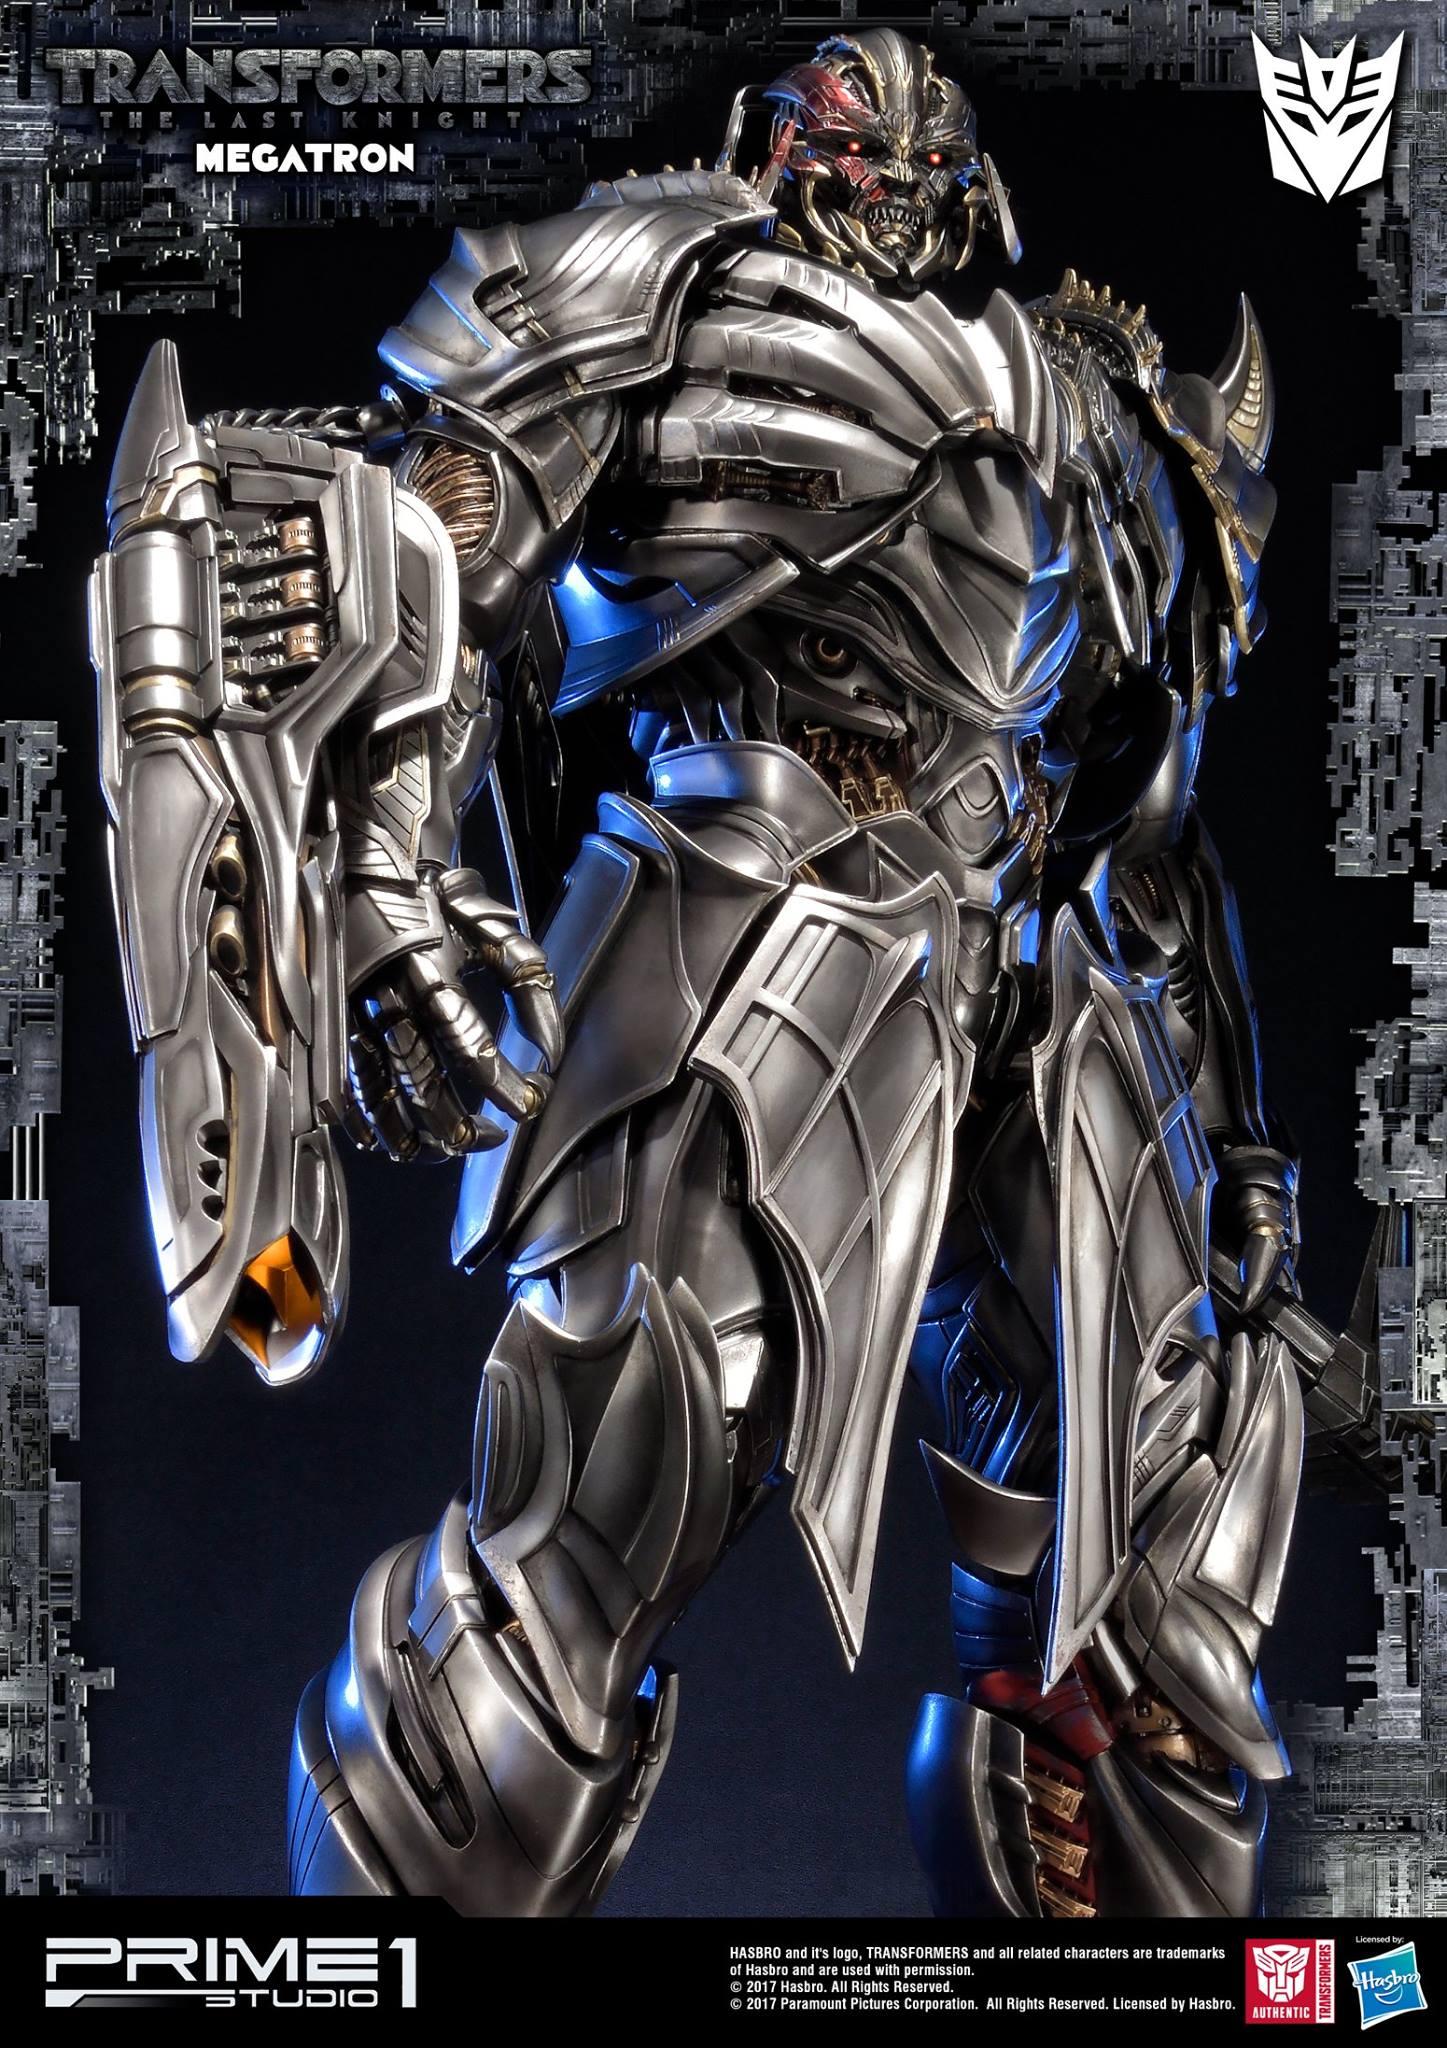 Prime 1 studios the last knight megatron statue transformers news tfw2005 - Transformers prime megatron ...